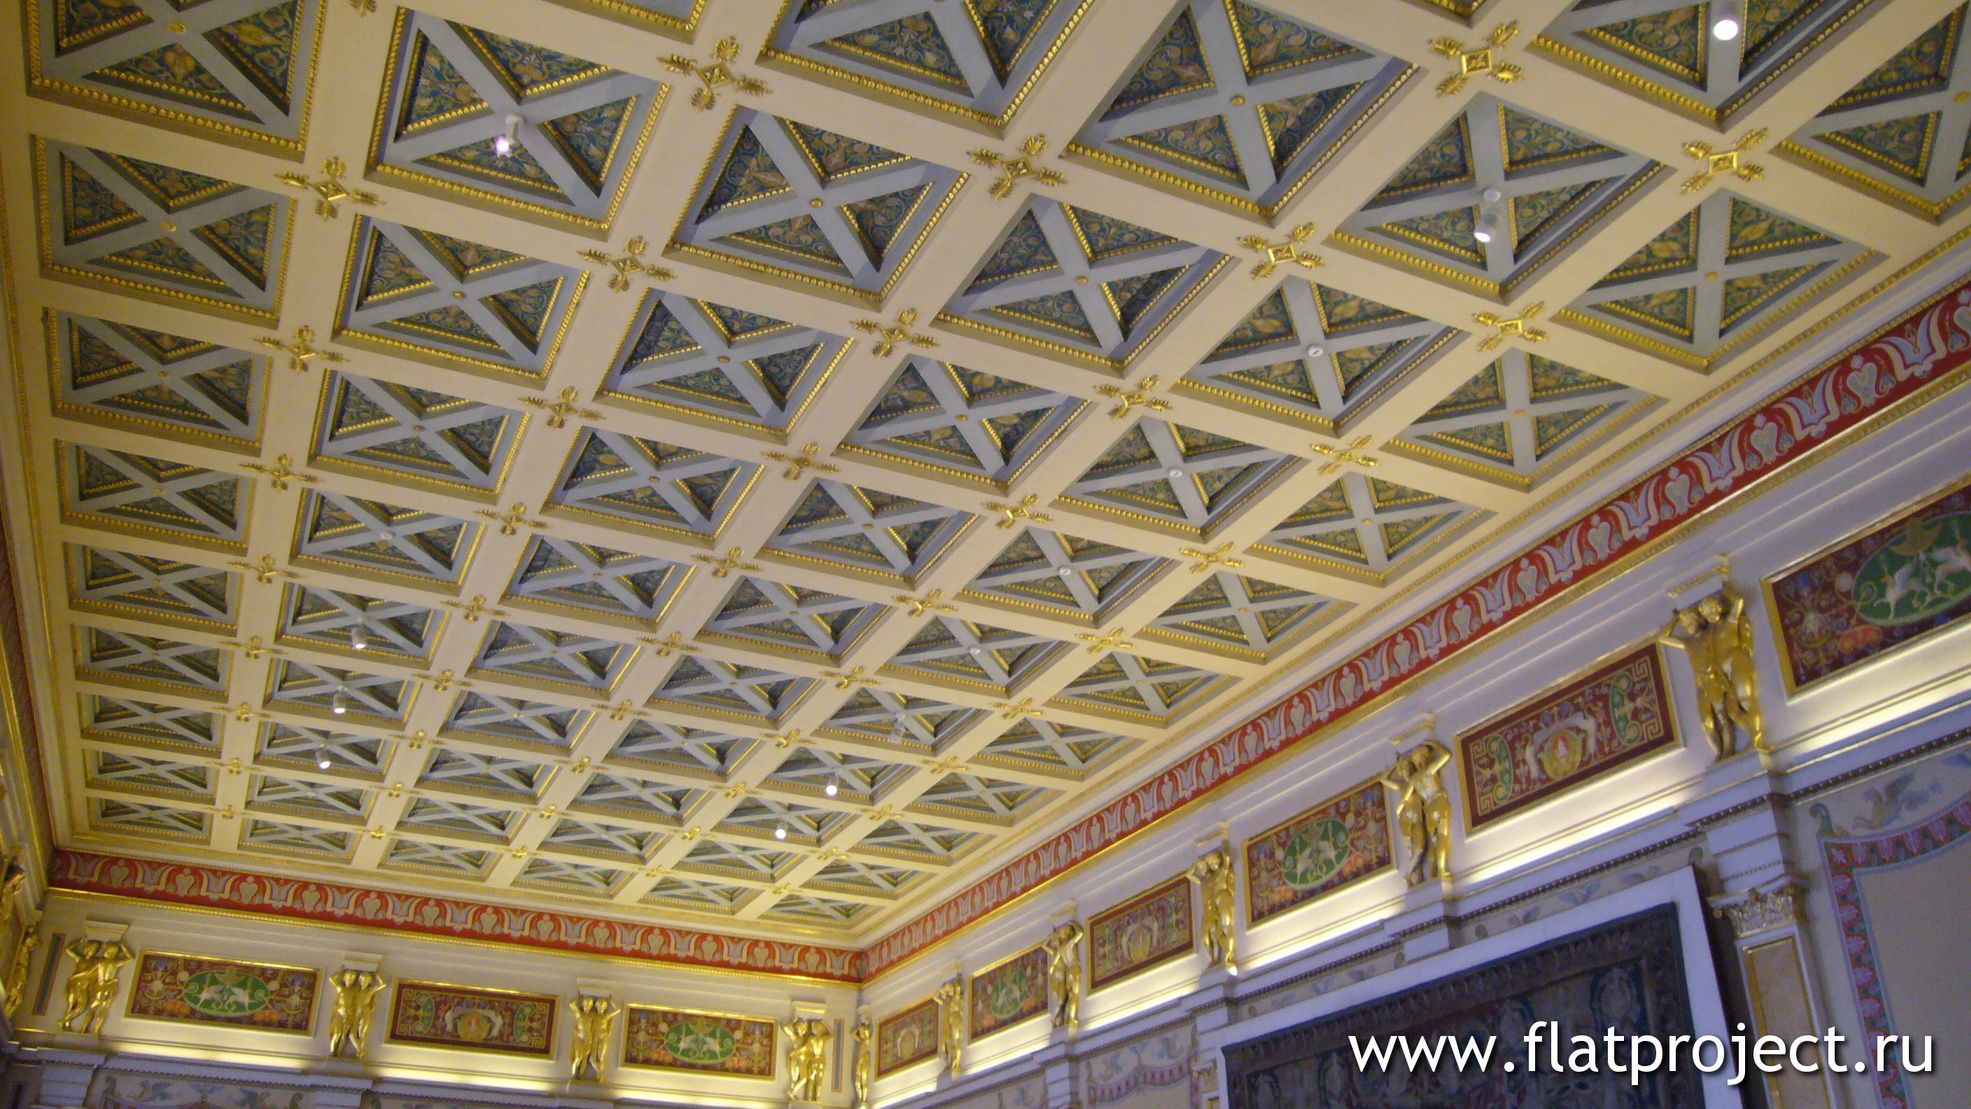 The State Hermitage museum interiors – photo 212